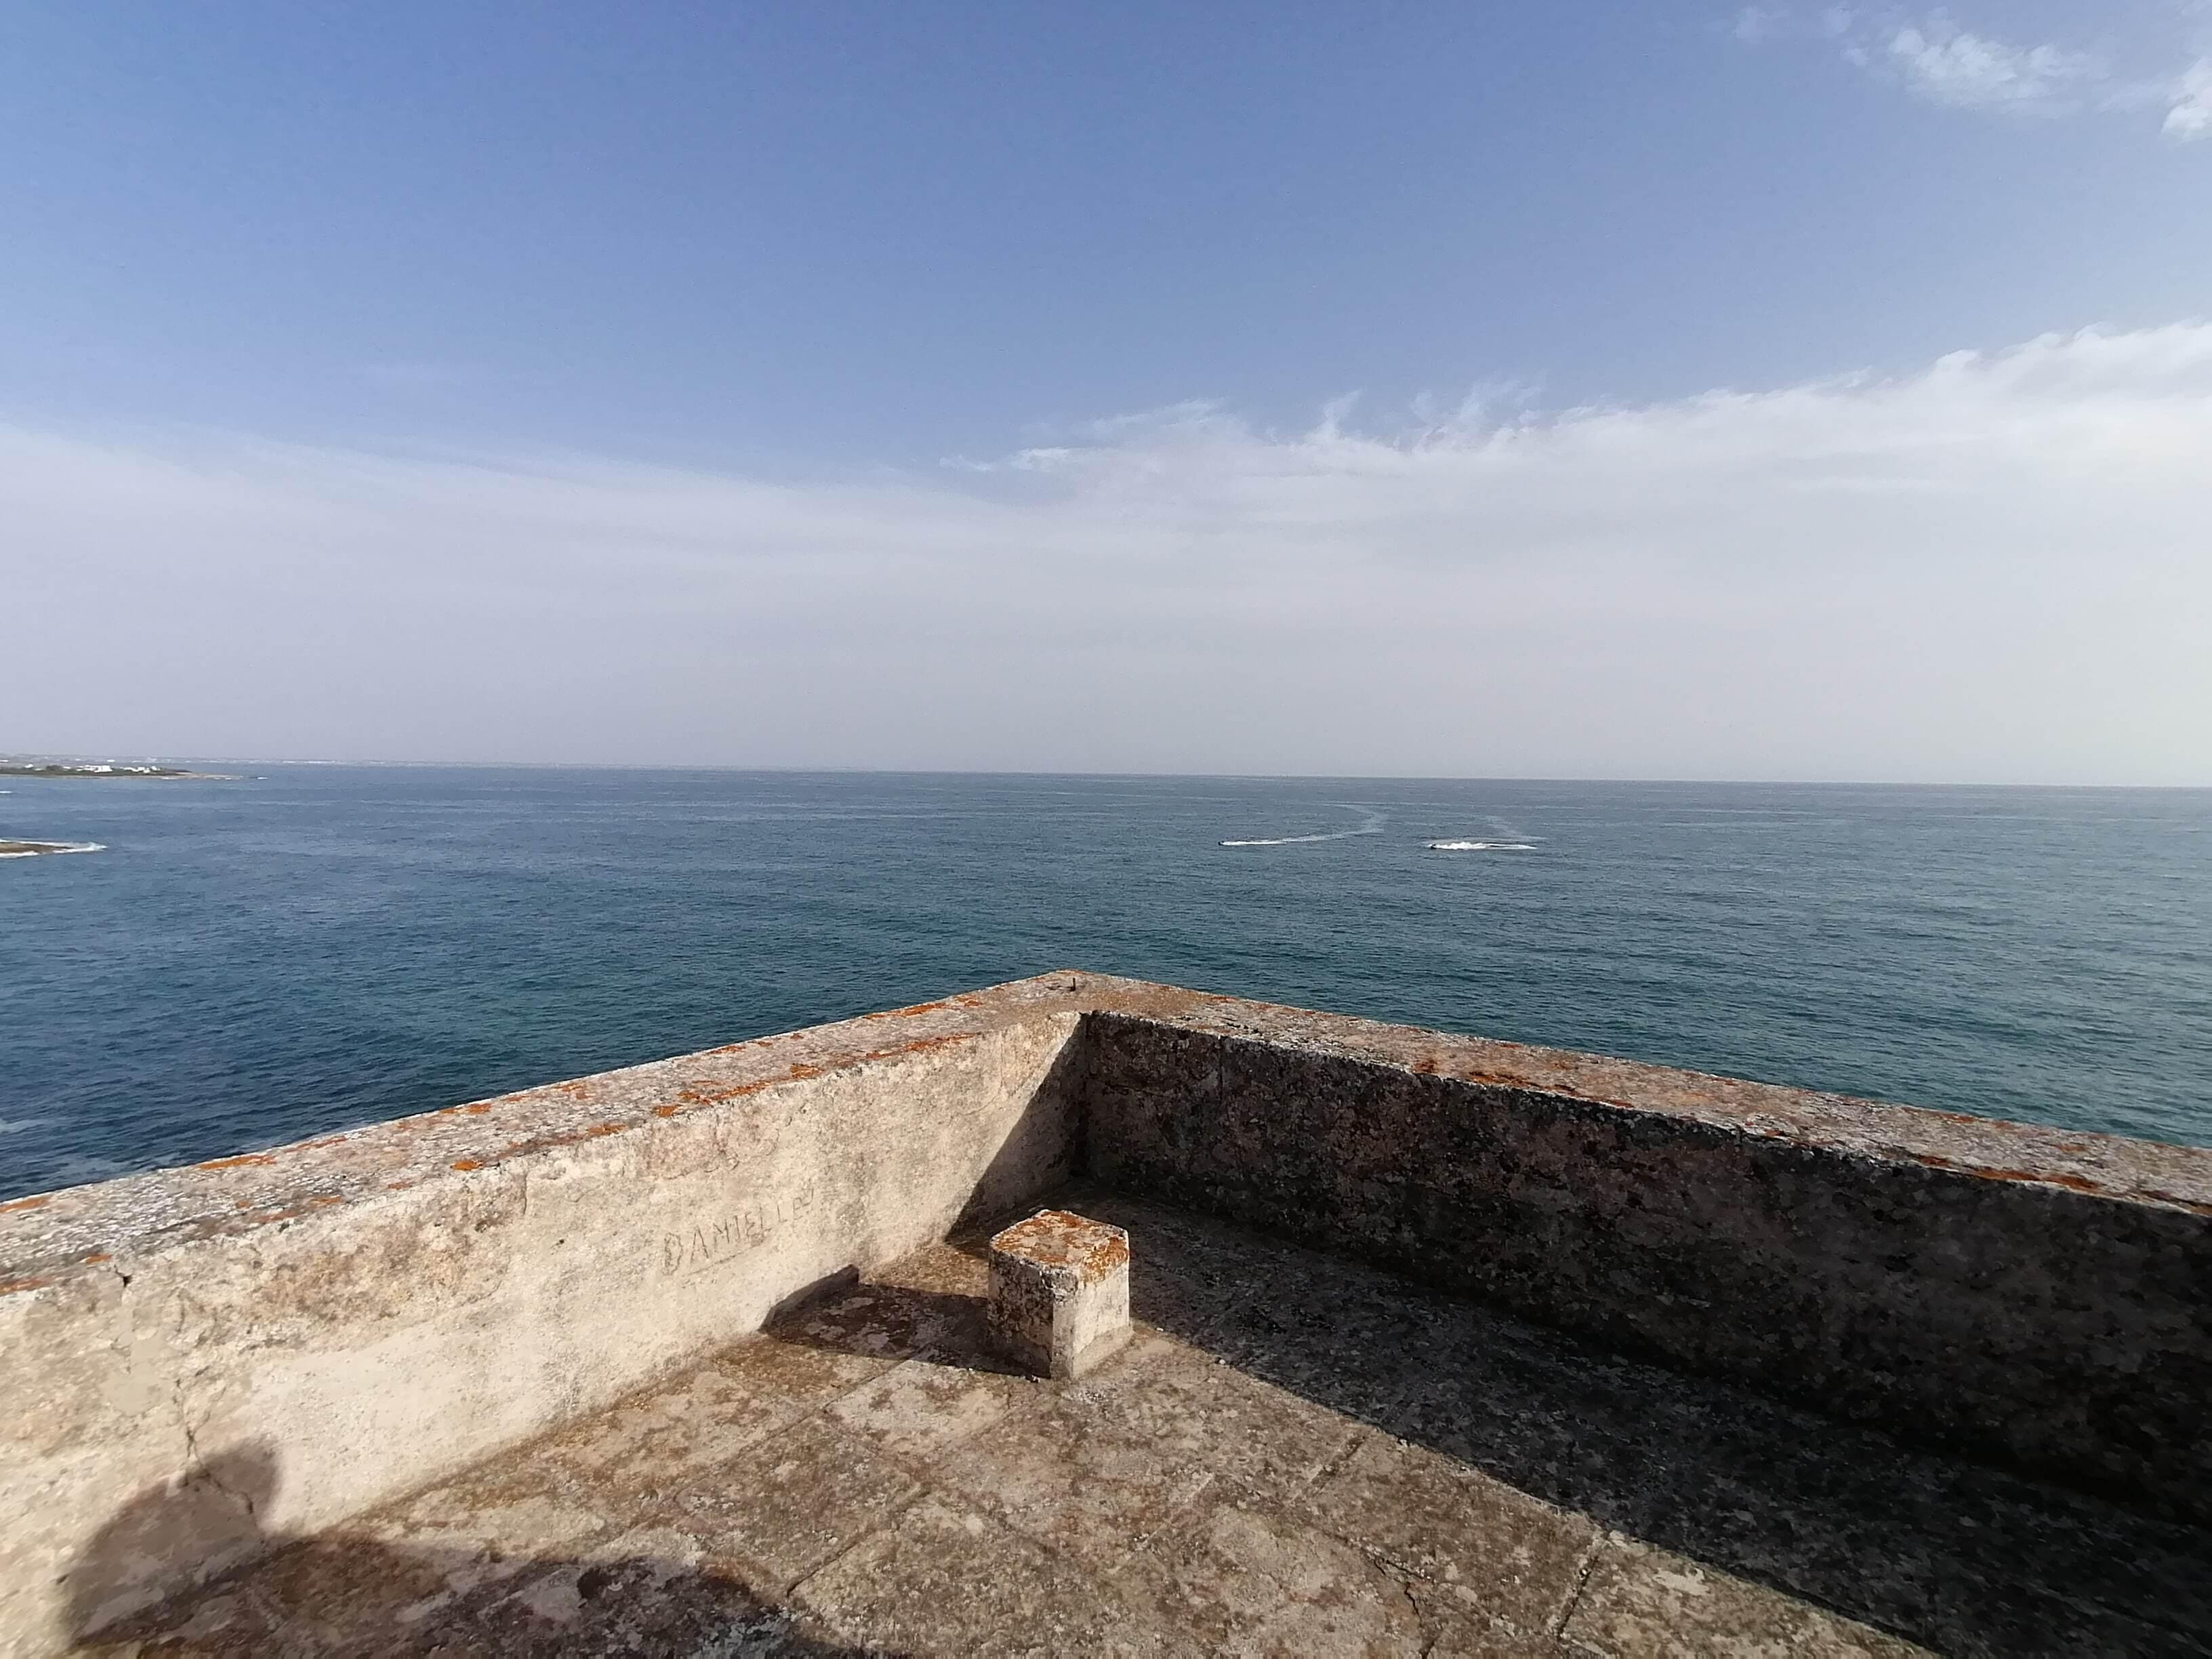 Torre colimena panoramica mar